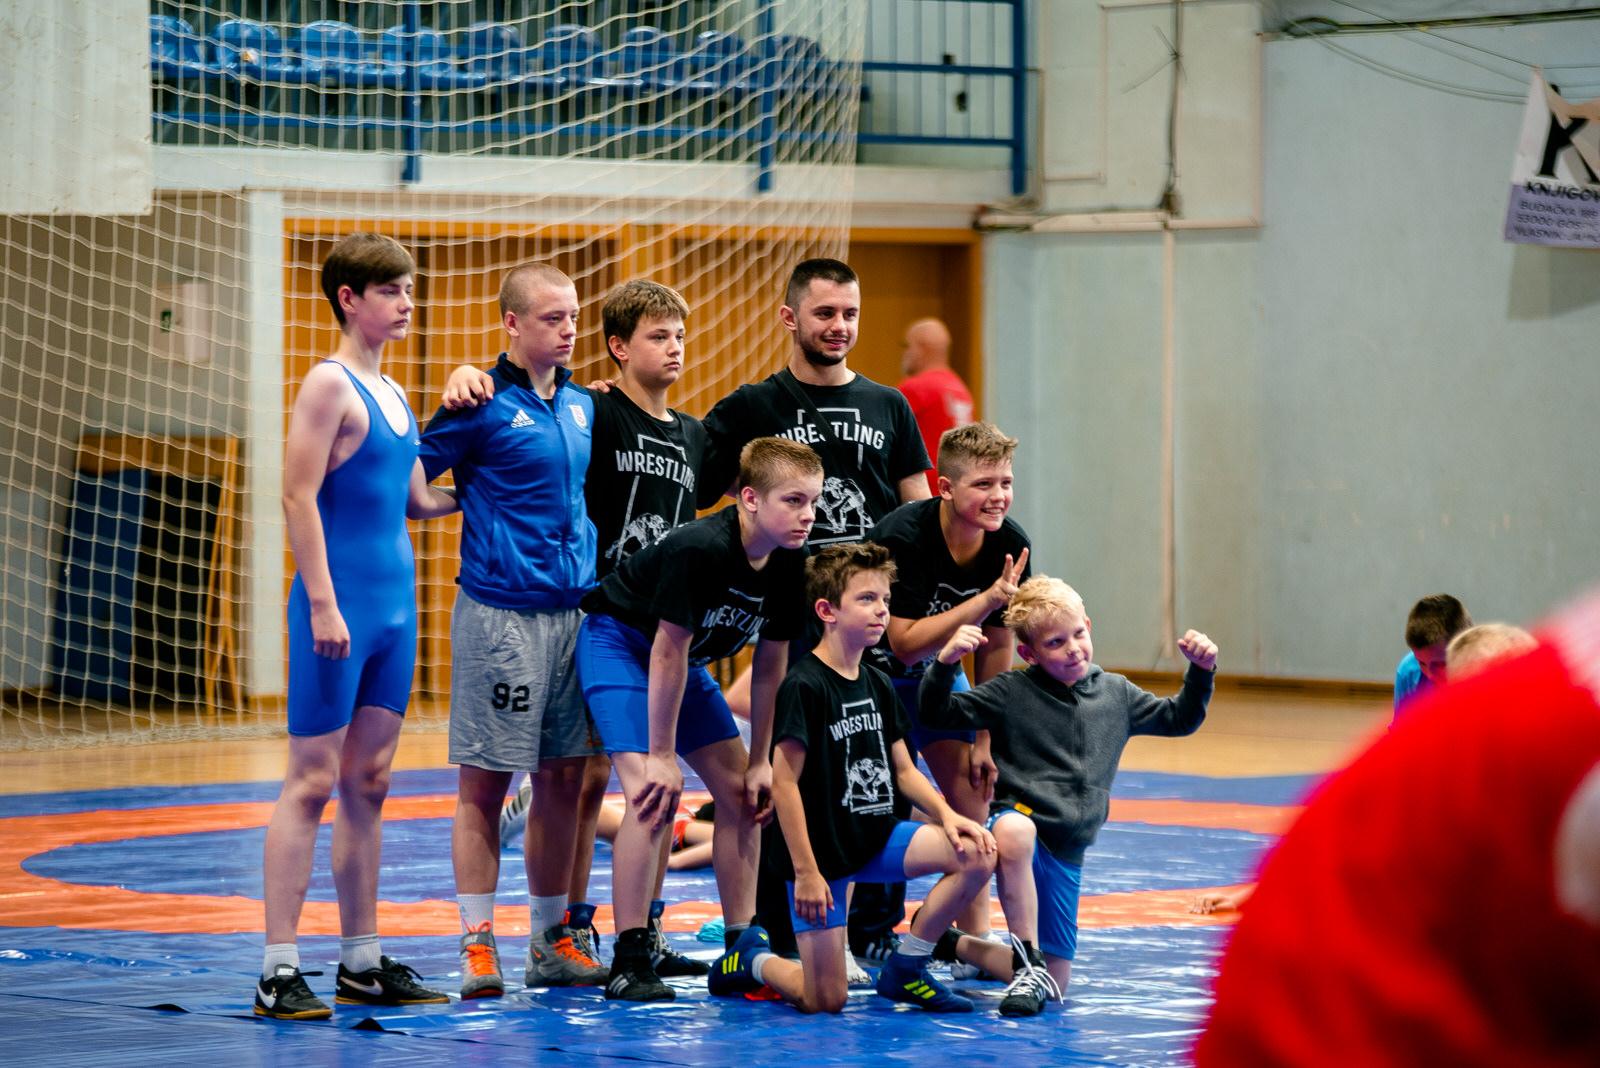 likaclub_gospić-open-hrvanje_2019-17